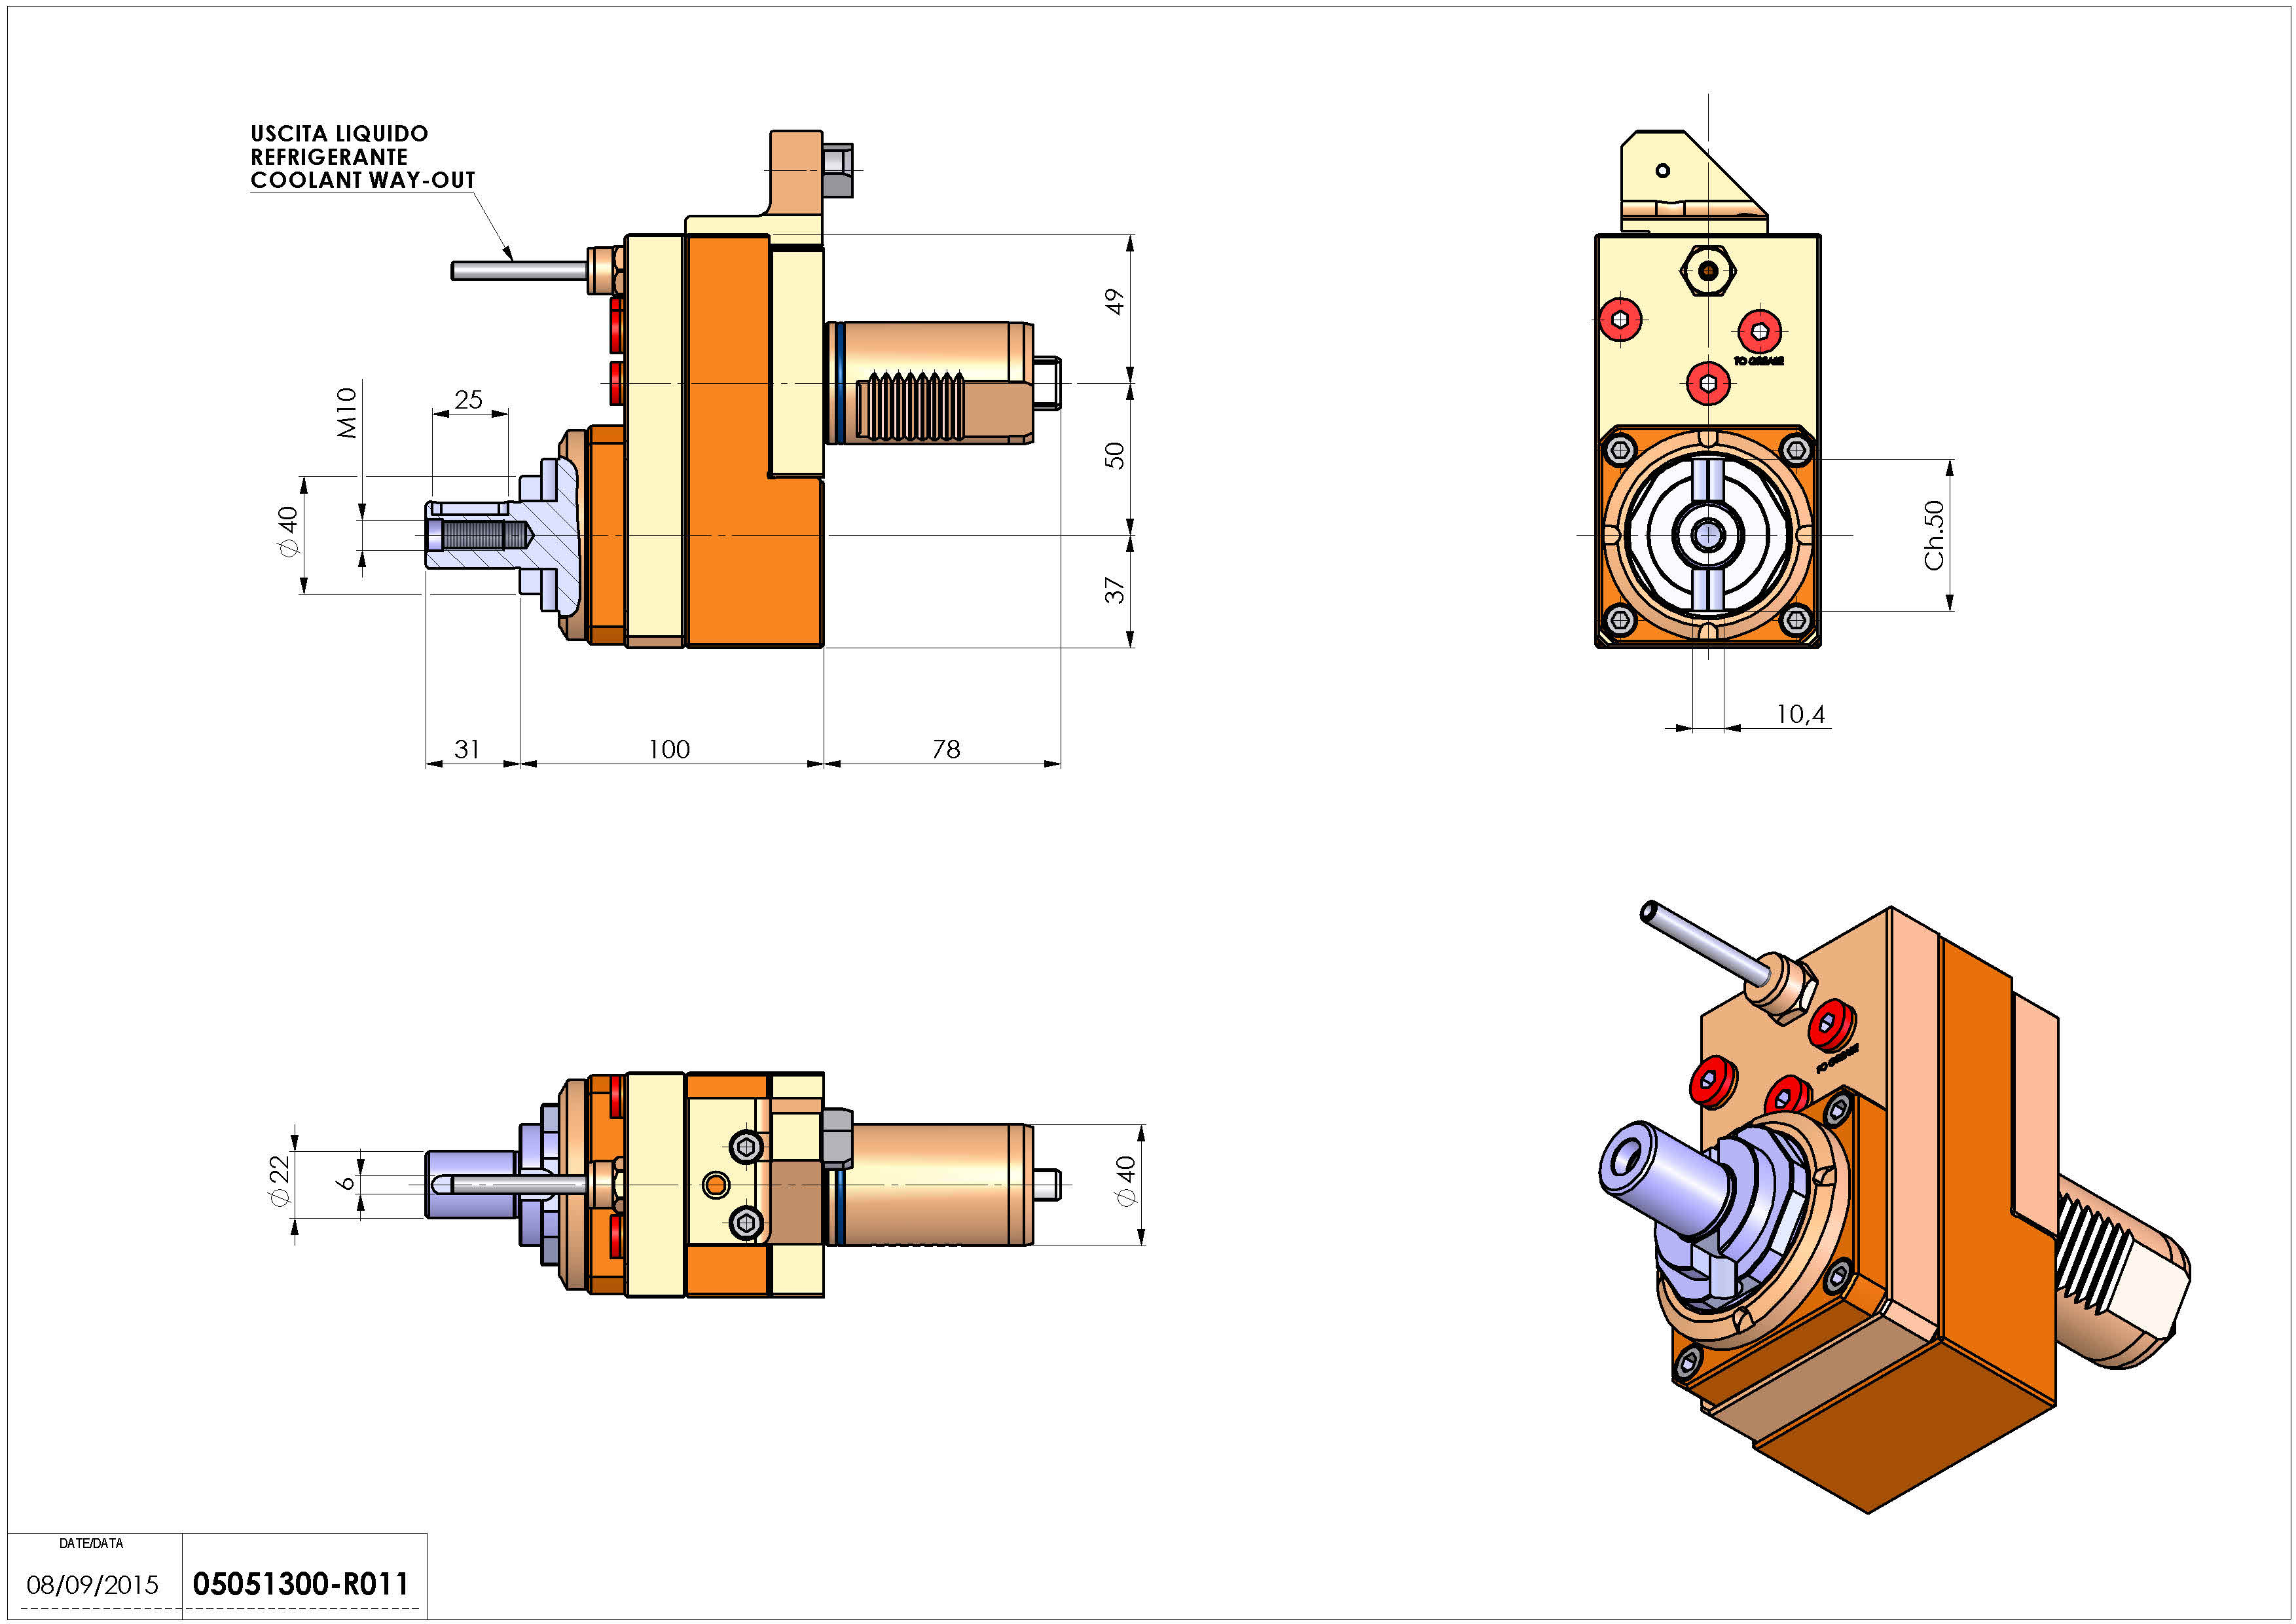 Technical image - LT-S VDI40 DIN22 OFS50 H100 MZ H100 MAZAK NEXUS QTN 200 250.